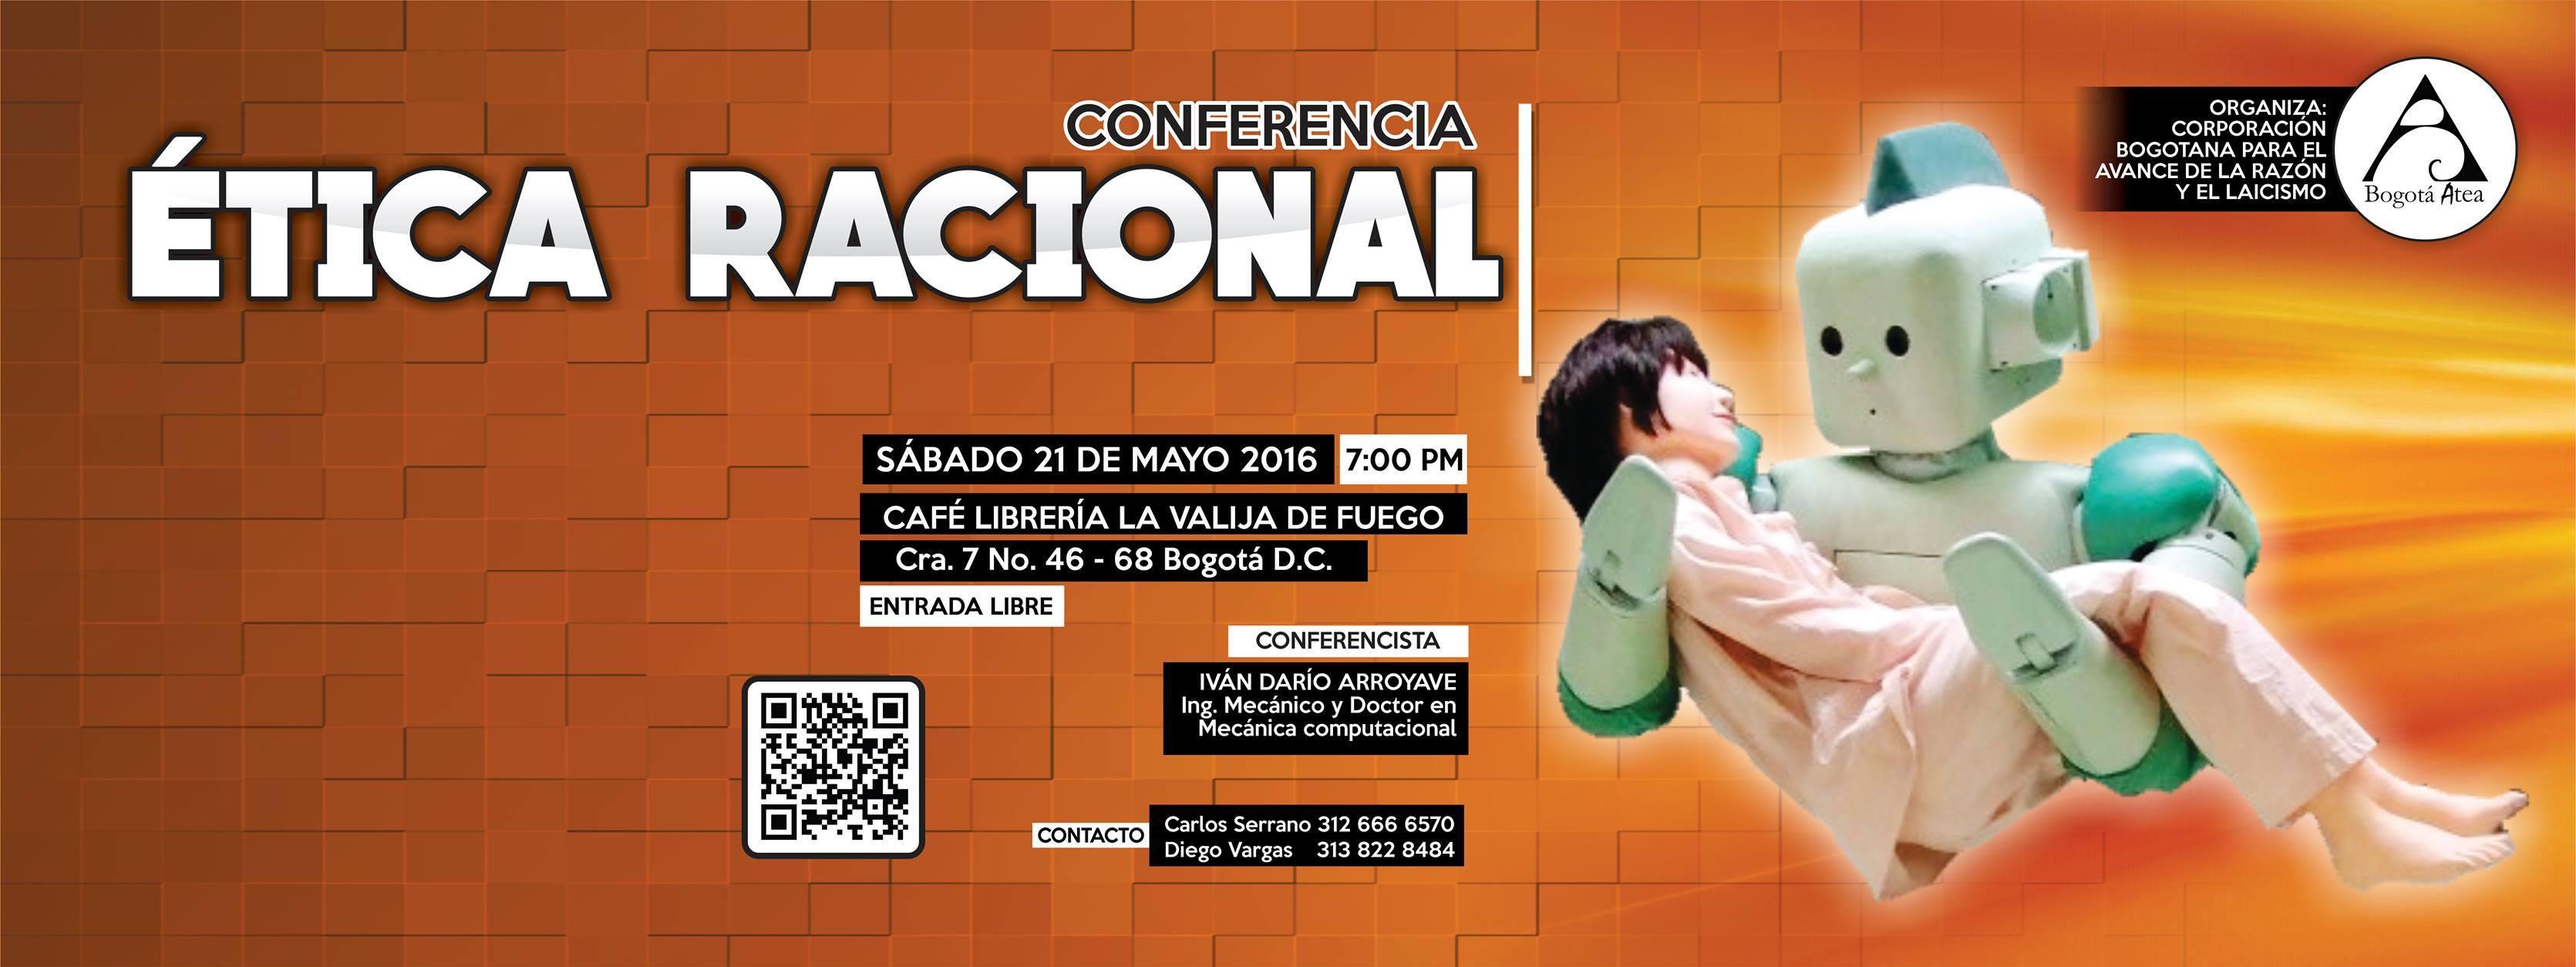 Ética-Racional-Bogotá-Mayo-2016.jpg